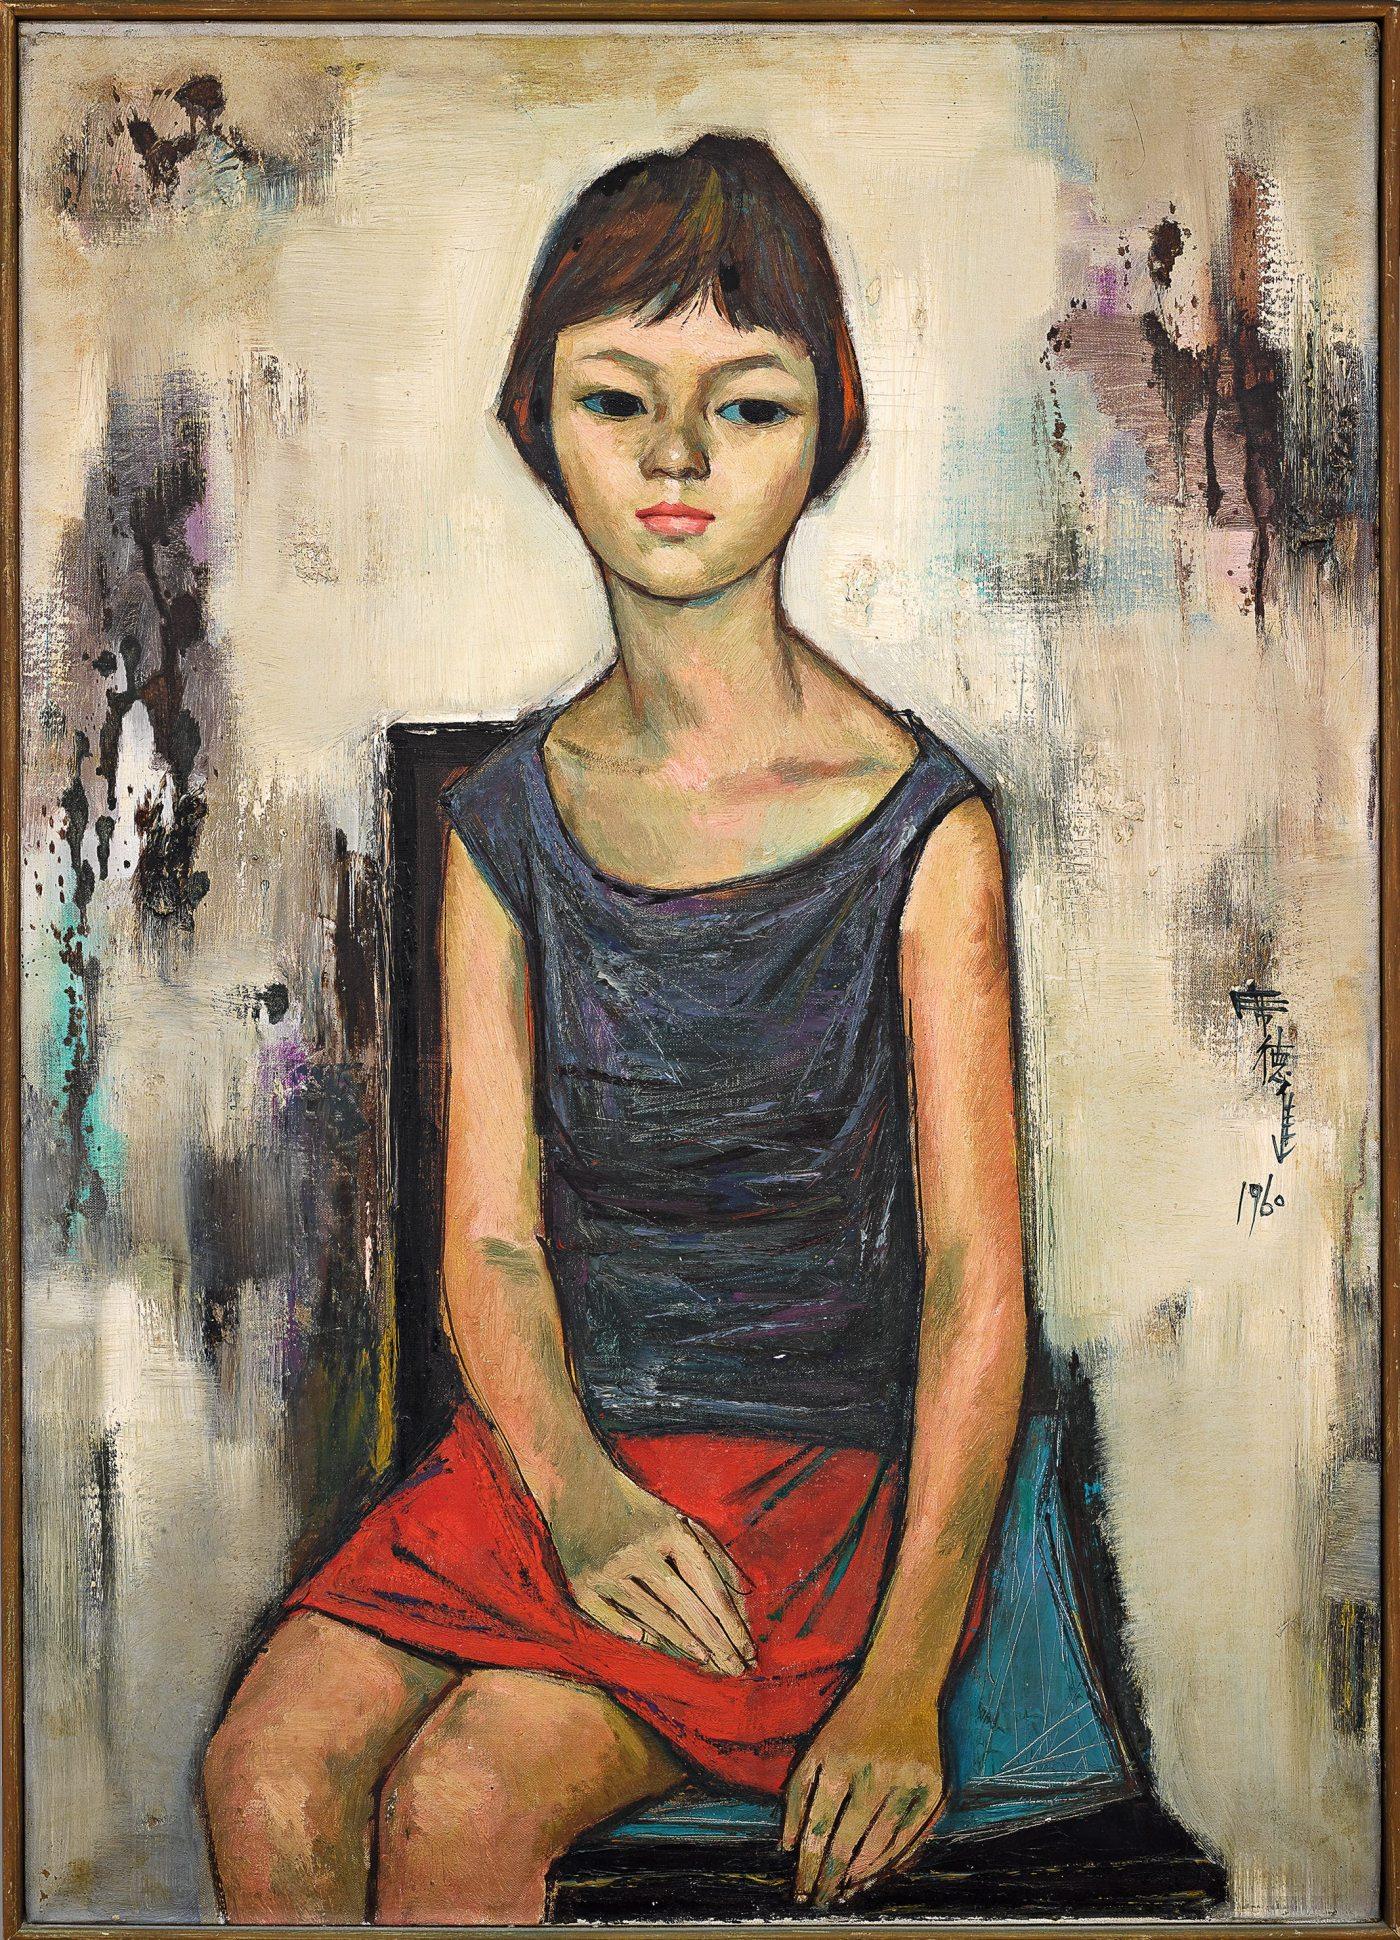 Shiy, De-Jinn_Young Girl_1960_91 x 65 cm_3343 x 2433 pixels_Sotheby's_HK0654_1027_a